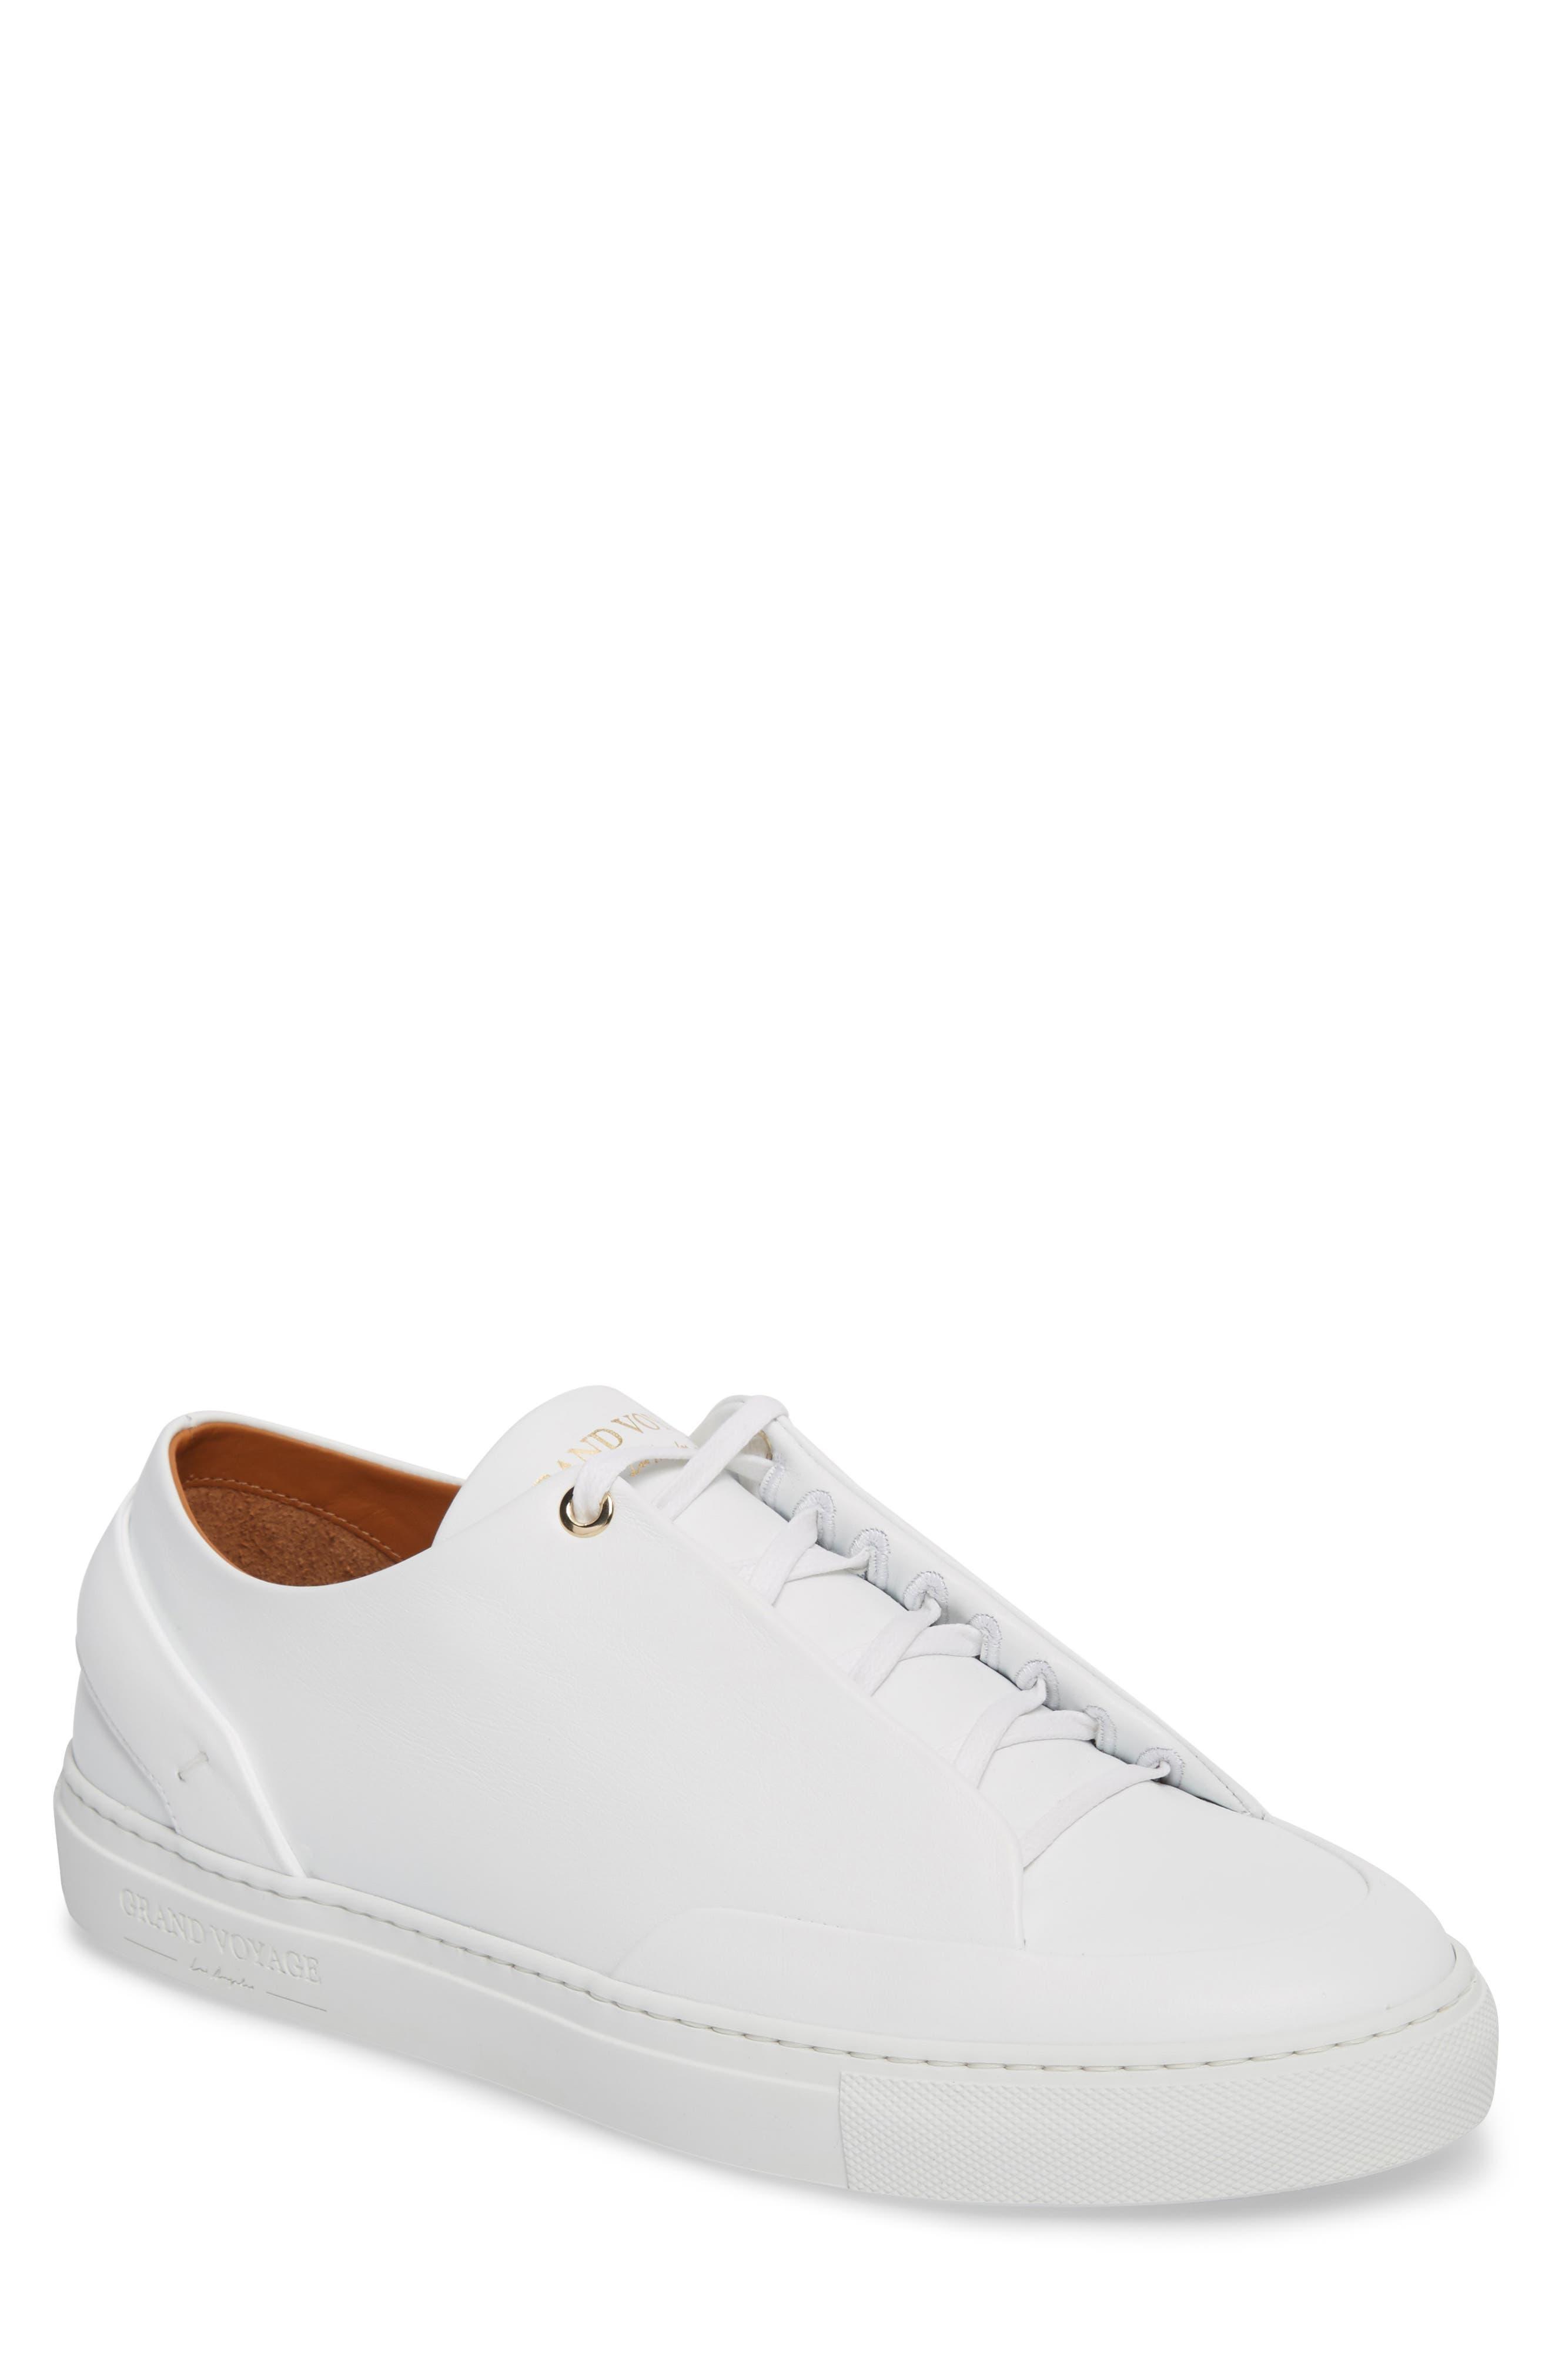 Grand Voyage Avedon Sneaker (Men)